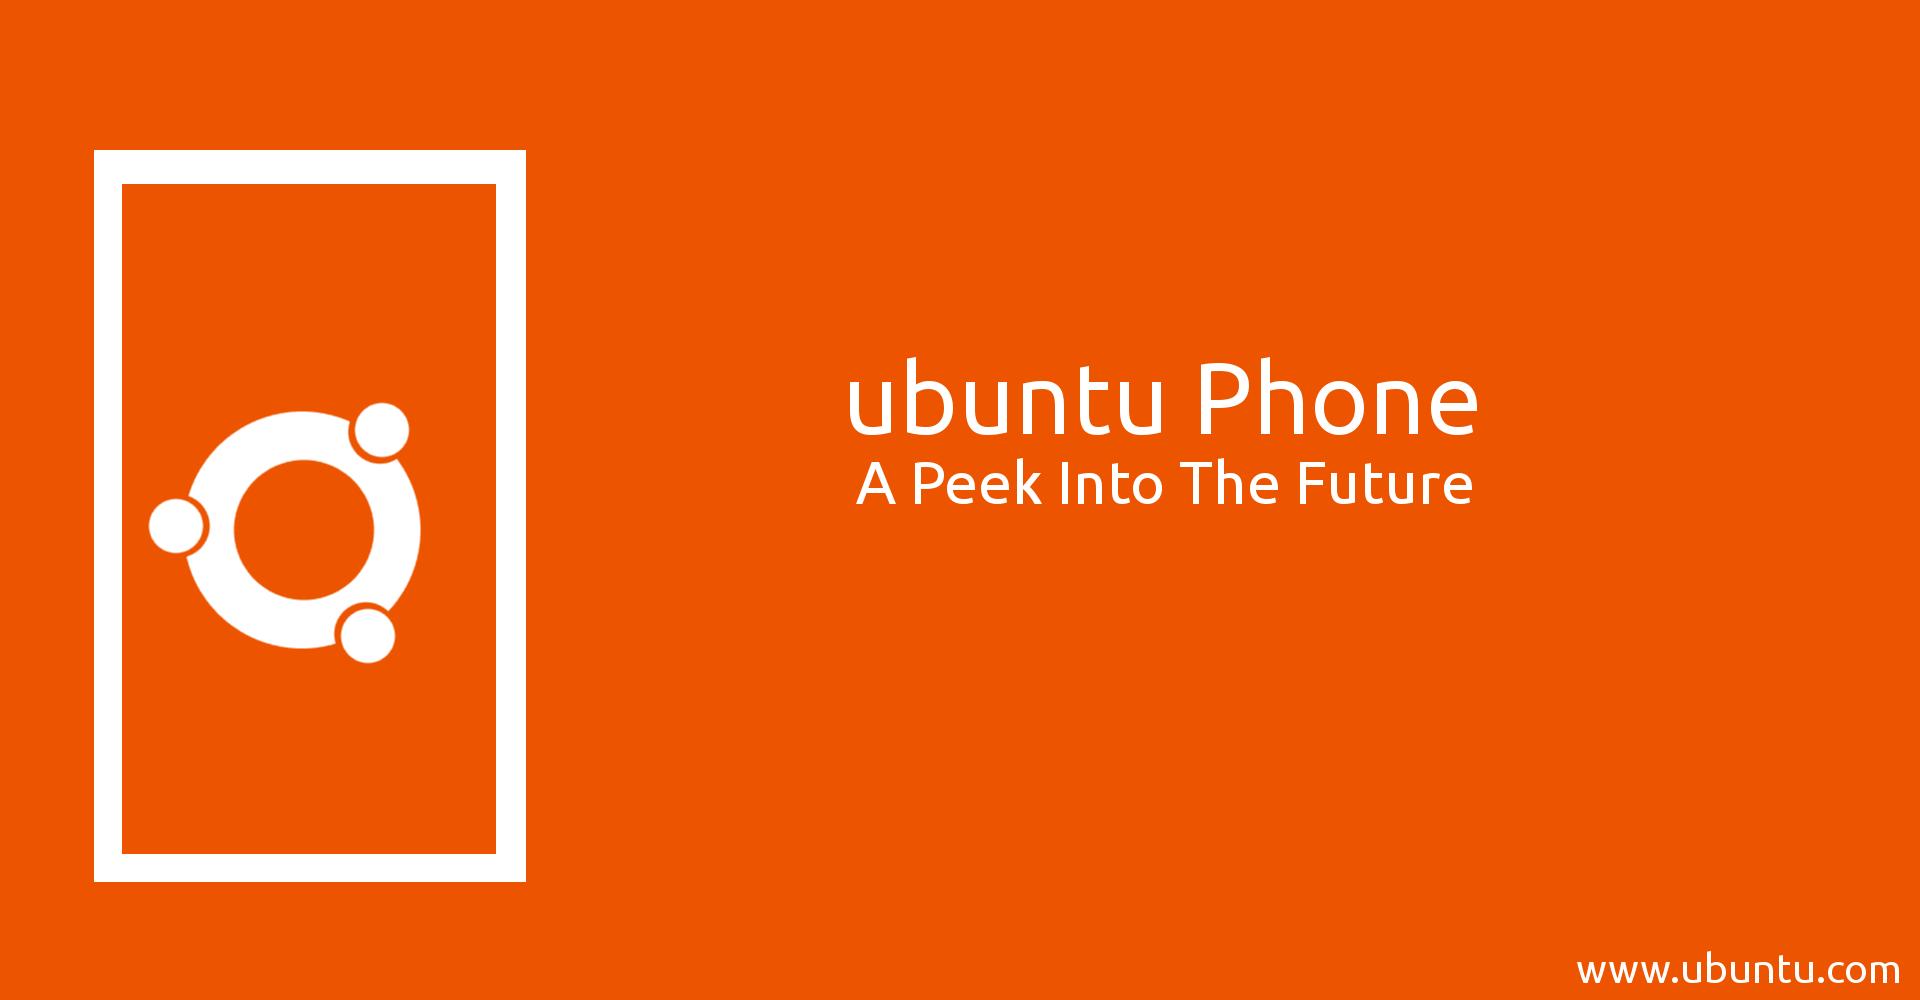 Ubuntu On Phone 14 Desktop Wallpaper Wallpaper 1920x1000